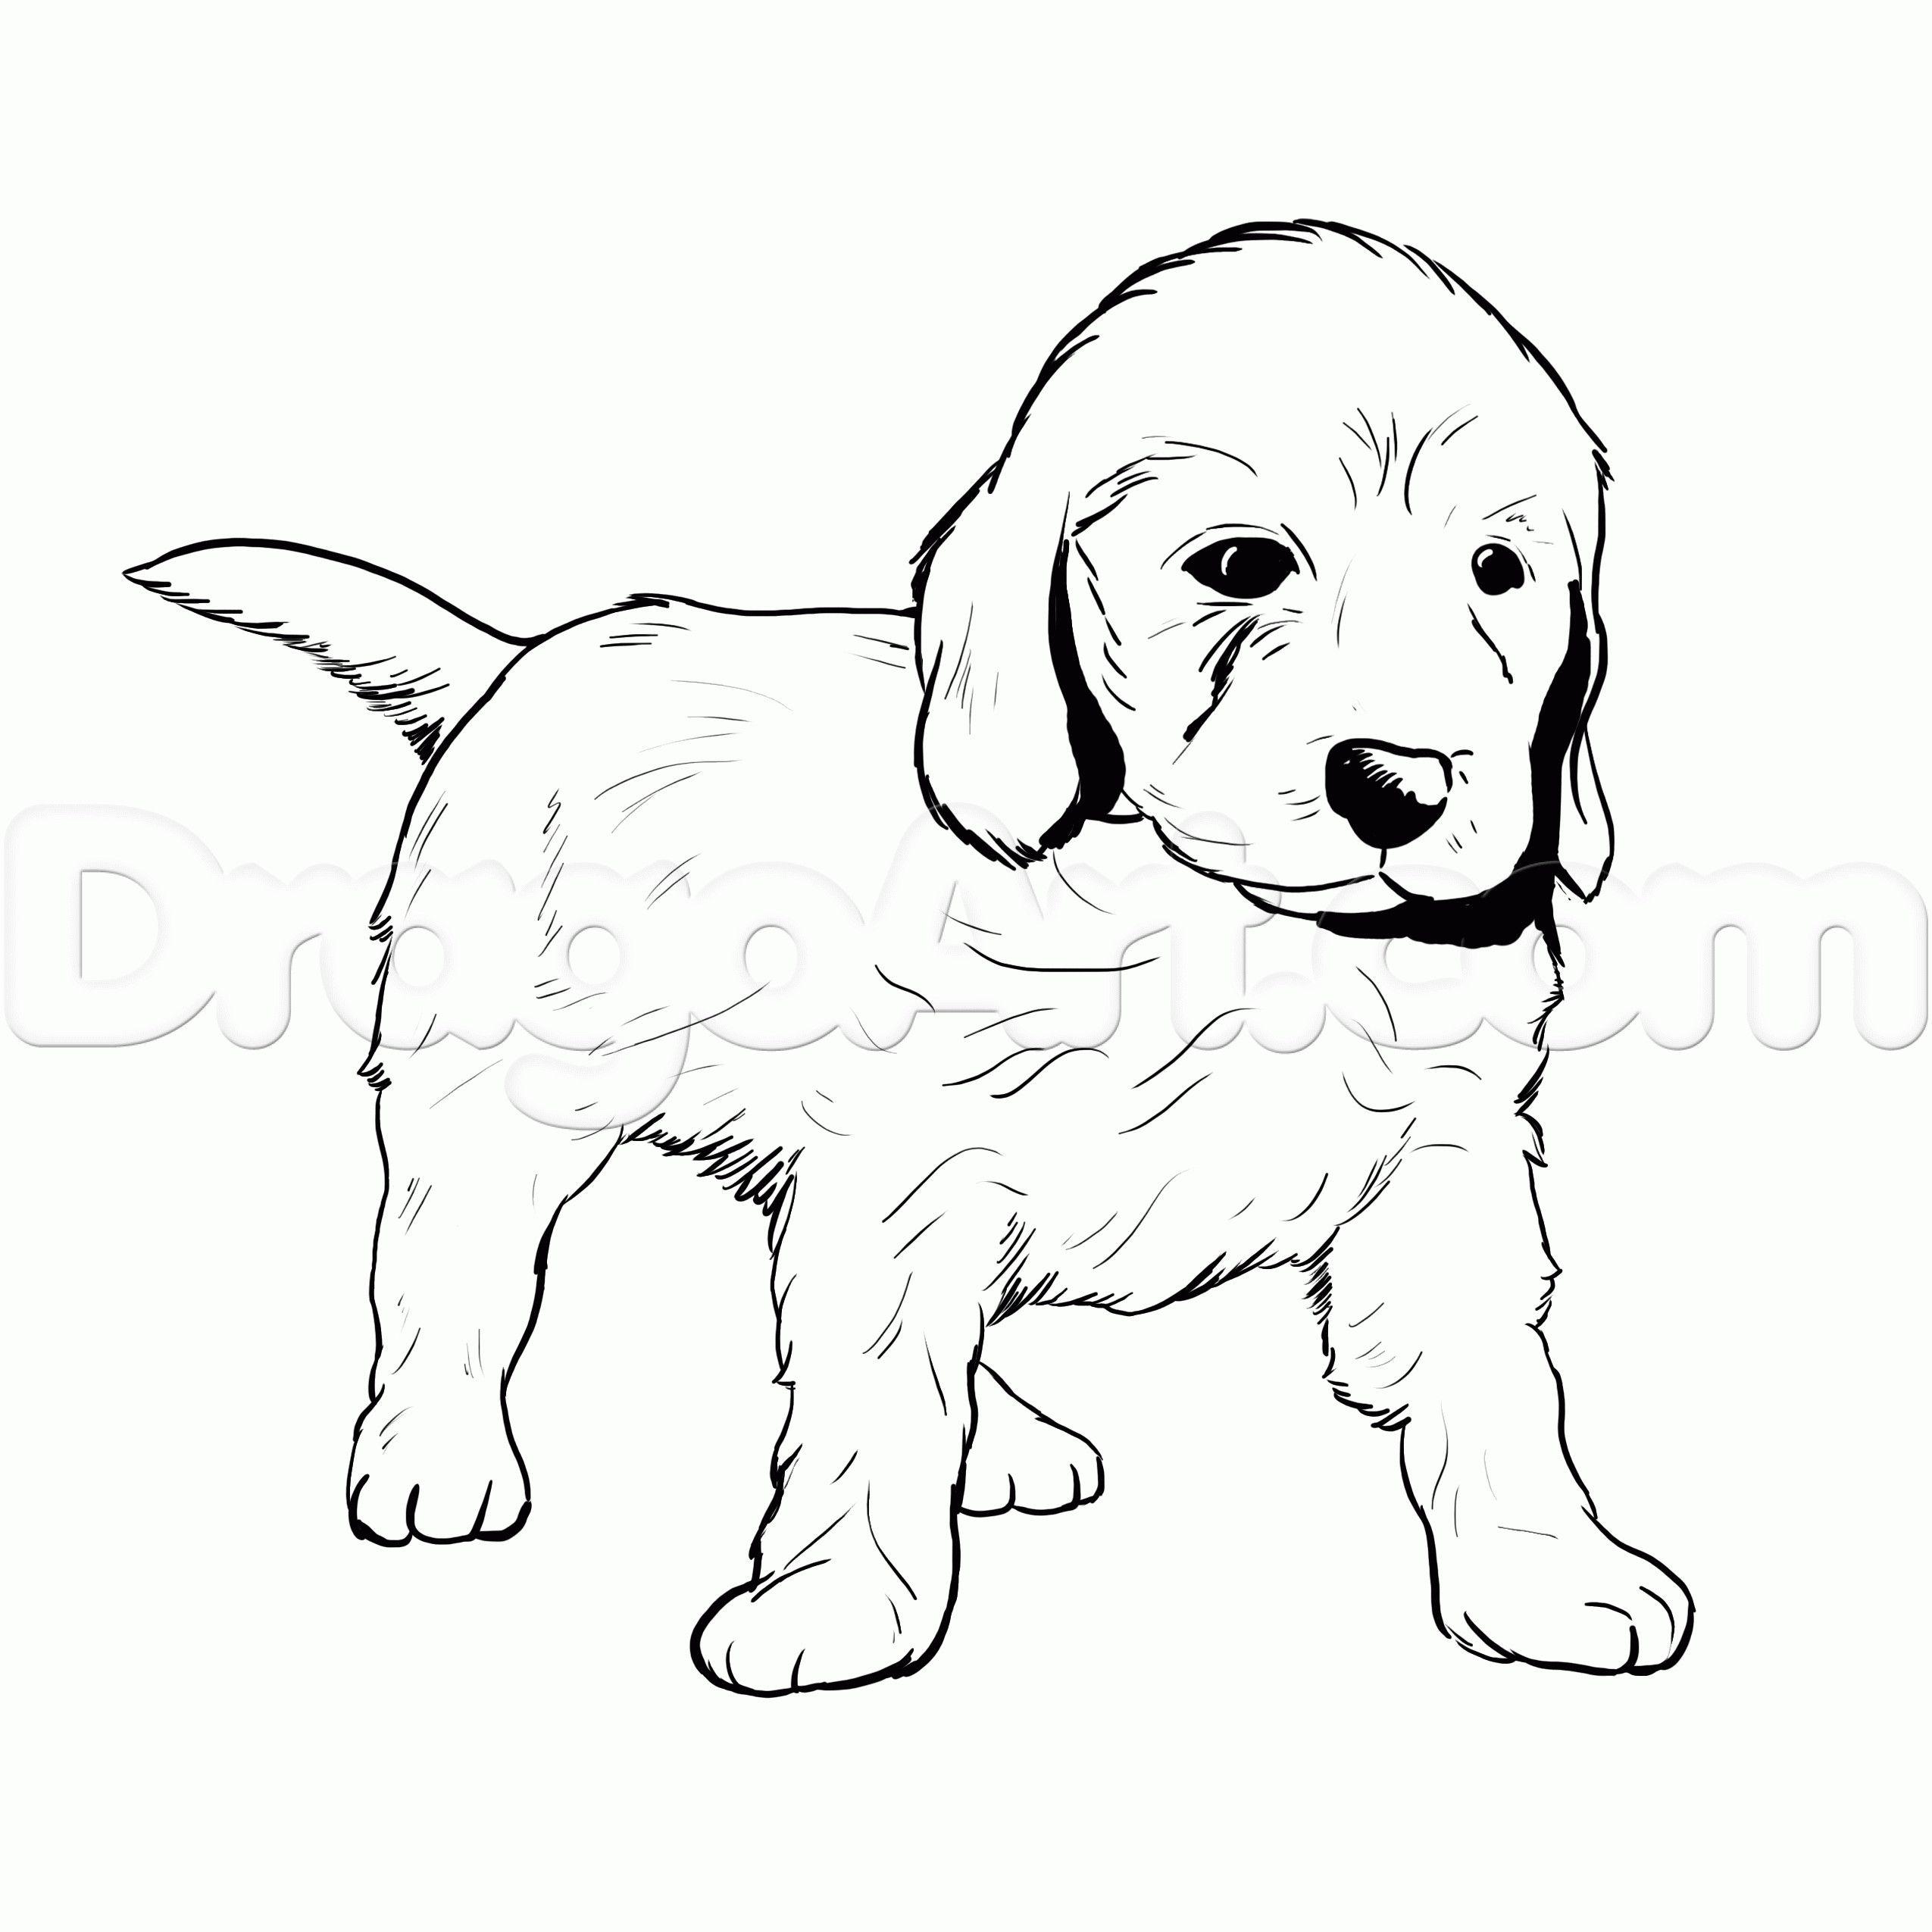 Labrador Retriever Coloring Page Free Printable Coloring Pages